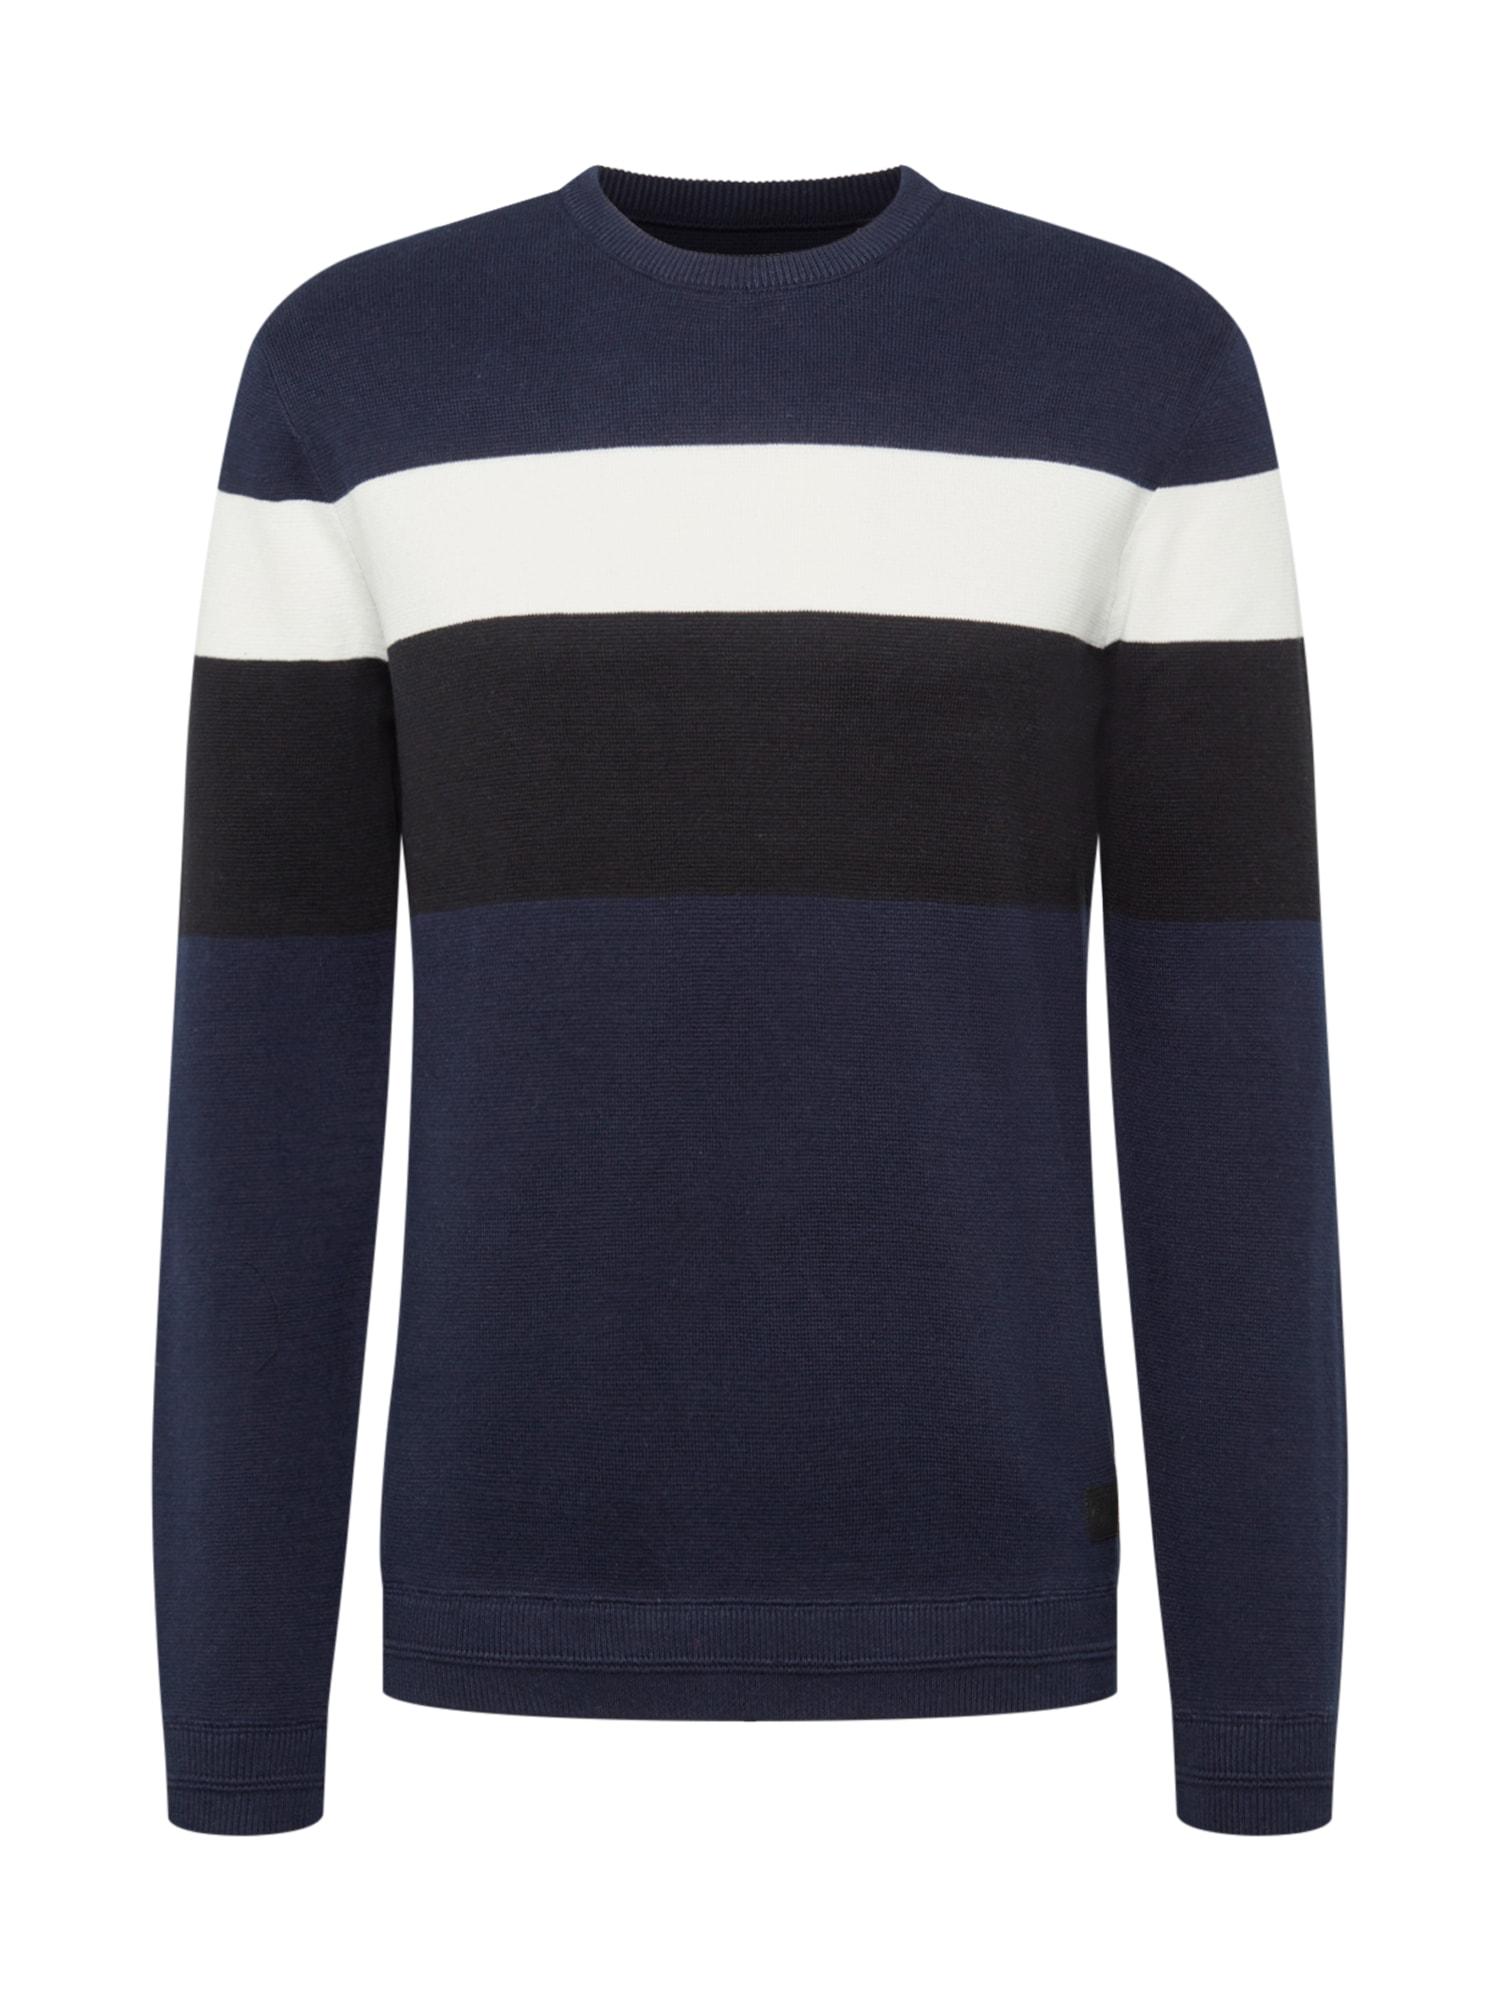 Only & Sons Svetr  námořnická modř / černá / bílá